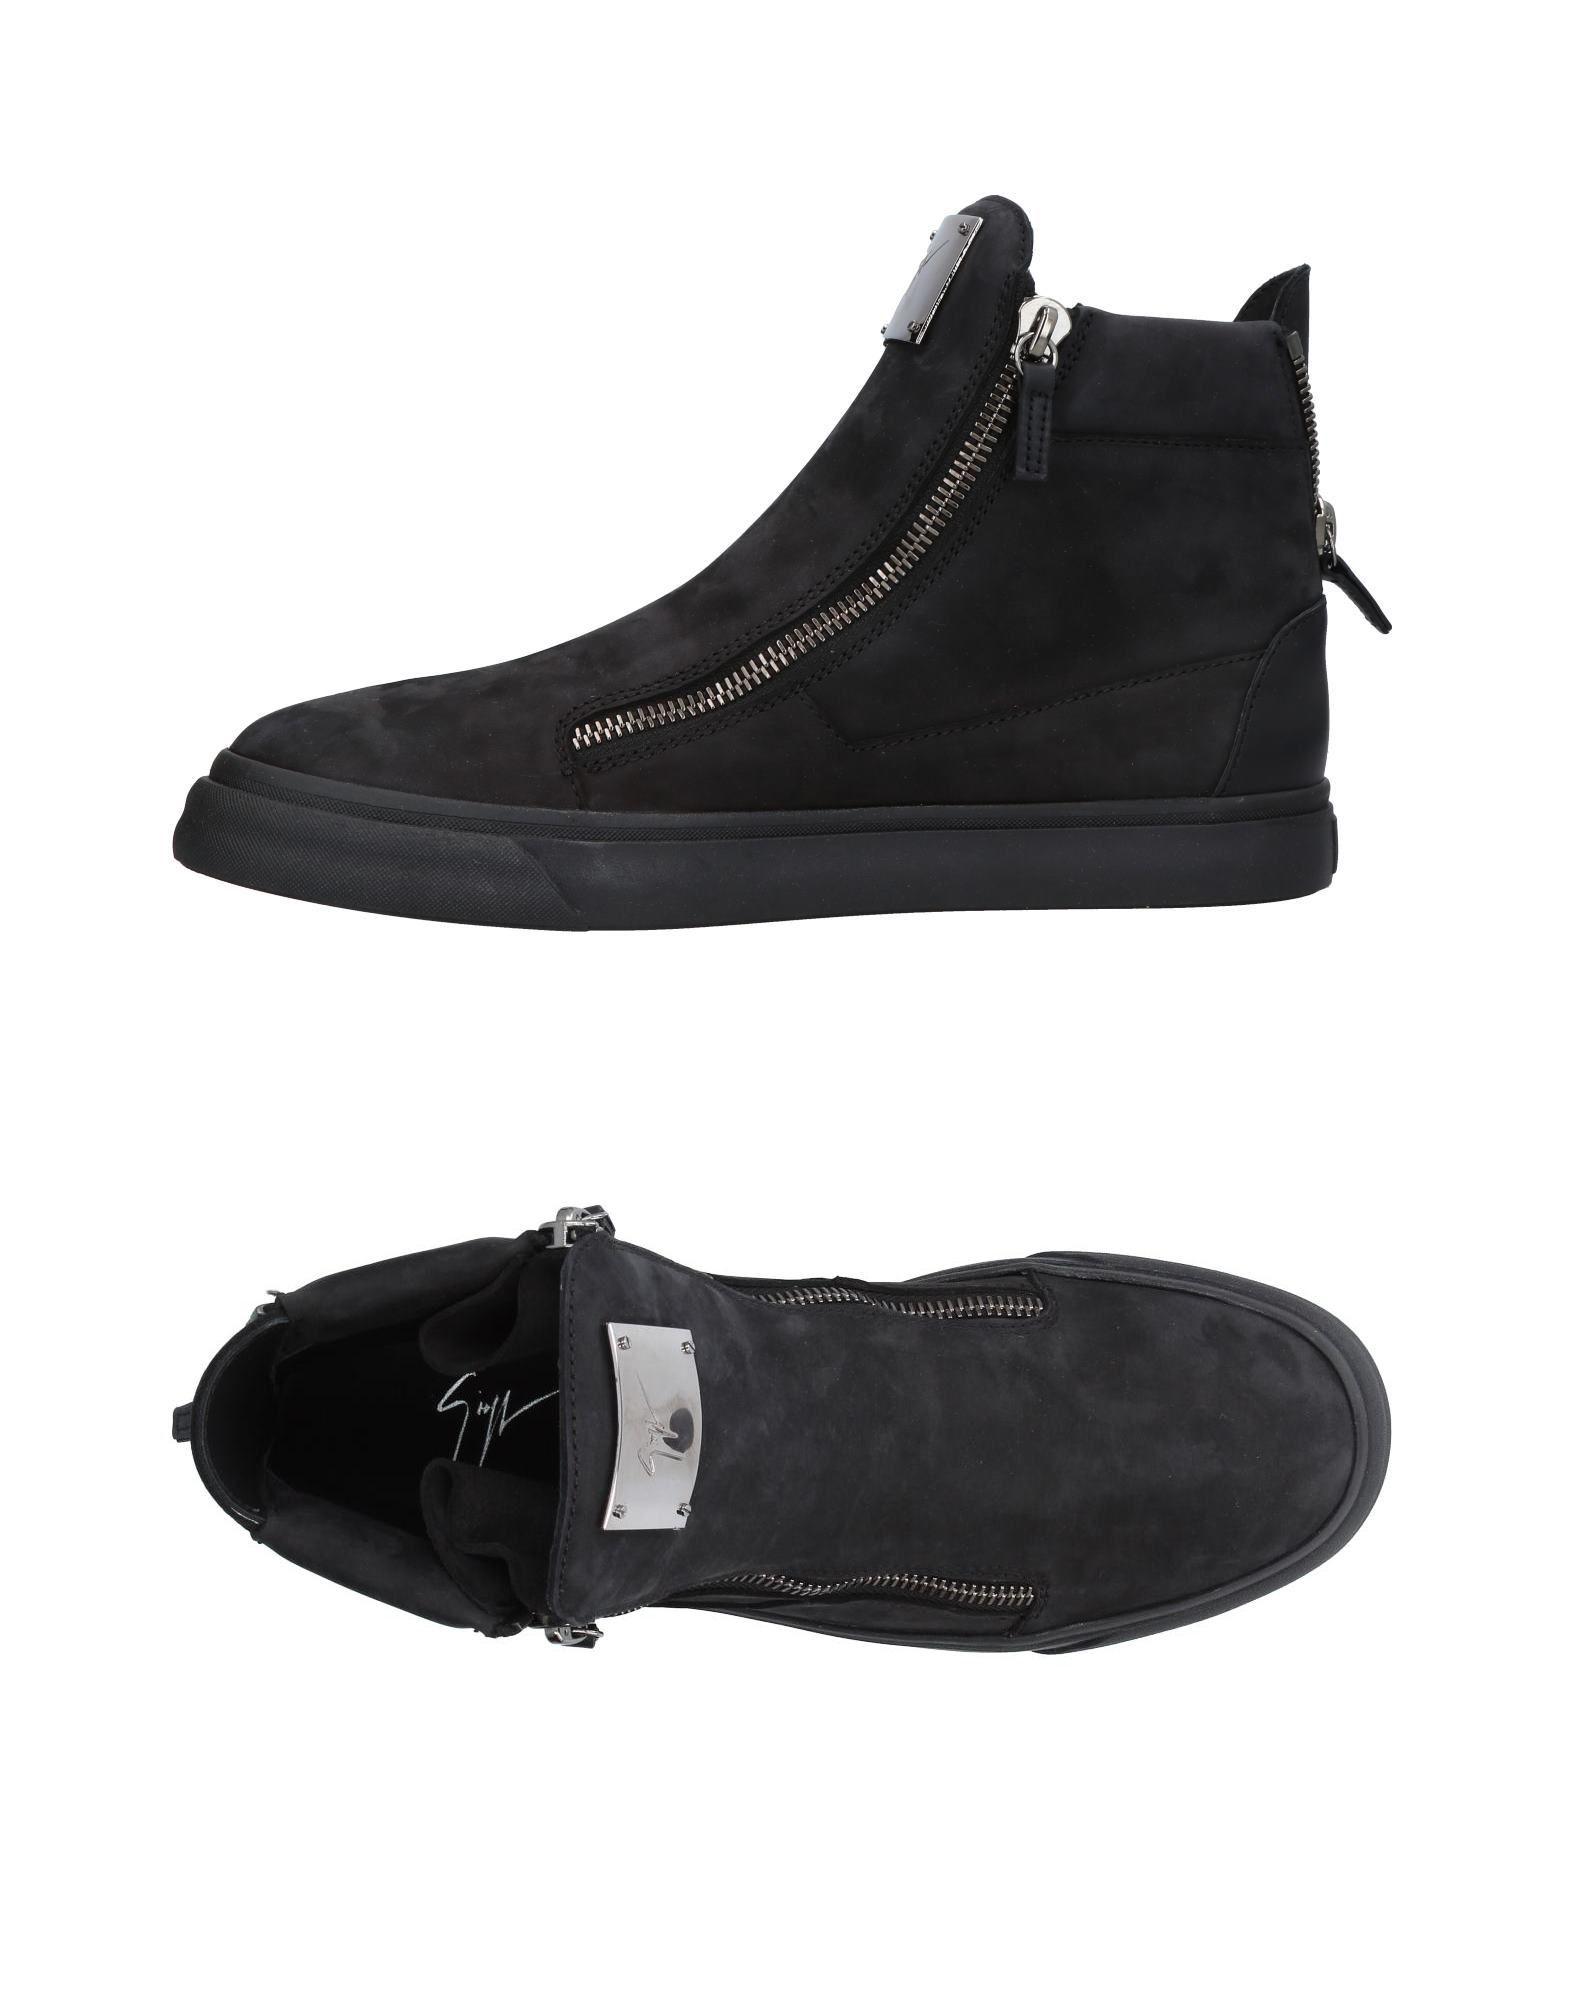 GIUSEPPE ZANOTTI DESIGN Herren High Sneakers & Tennisschuhe Farbe Schwarz Größe 5 jetztbilligerkaufen